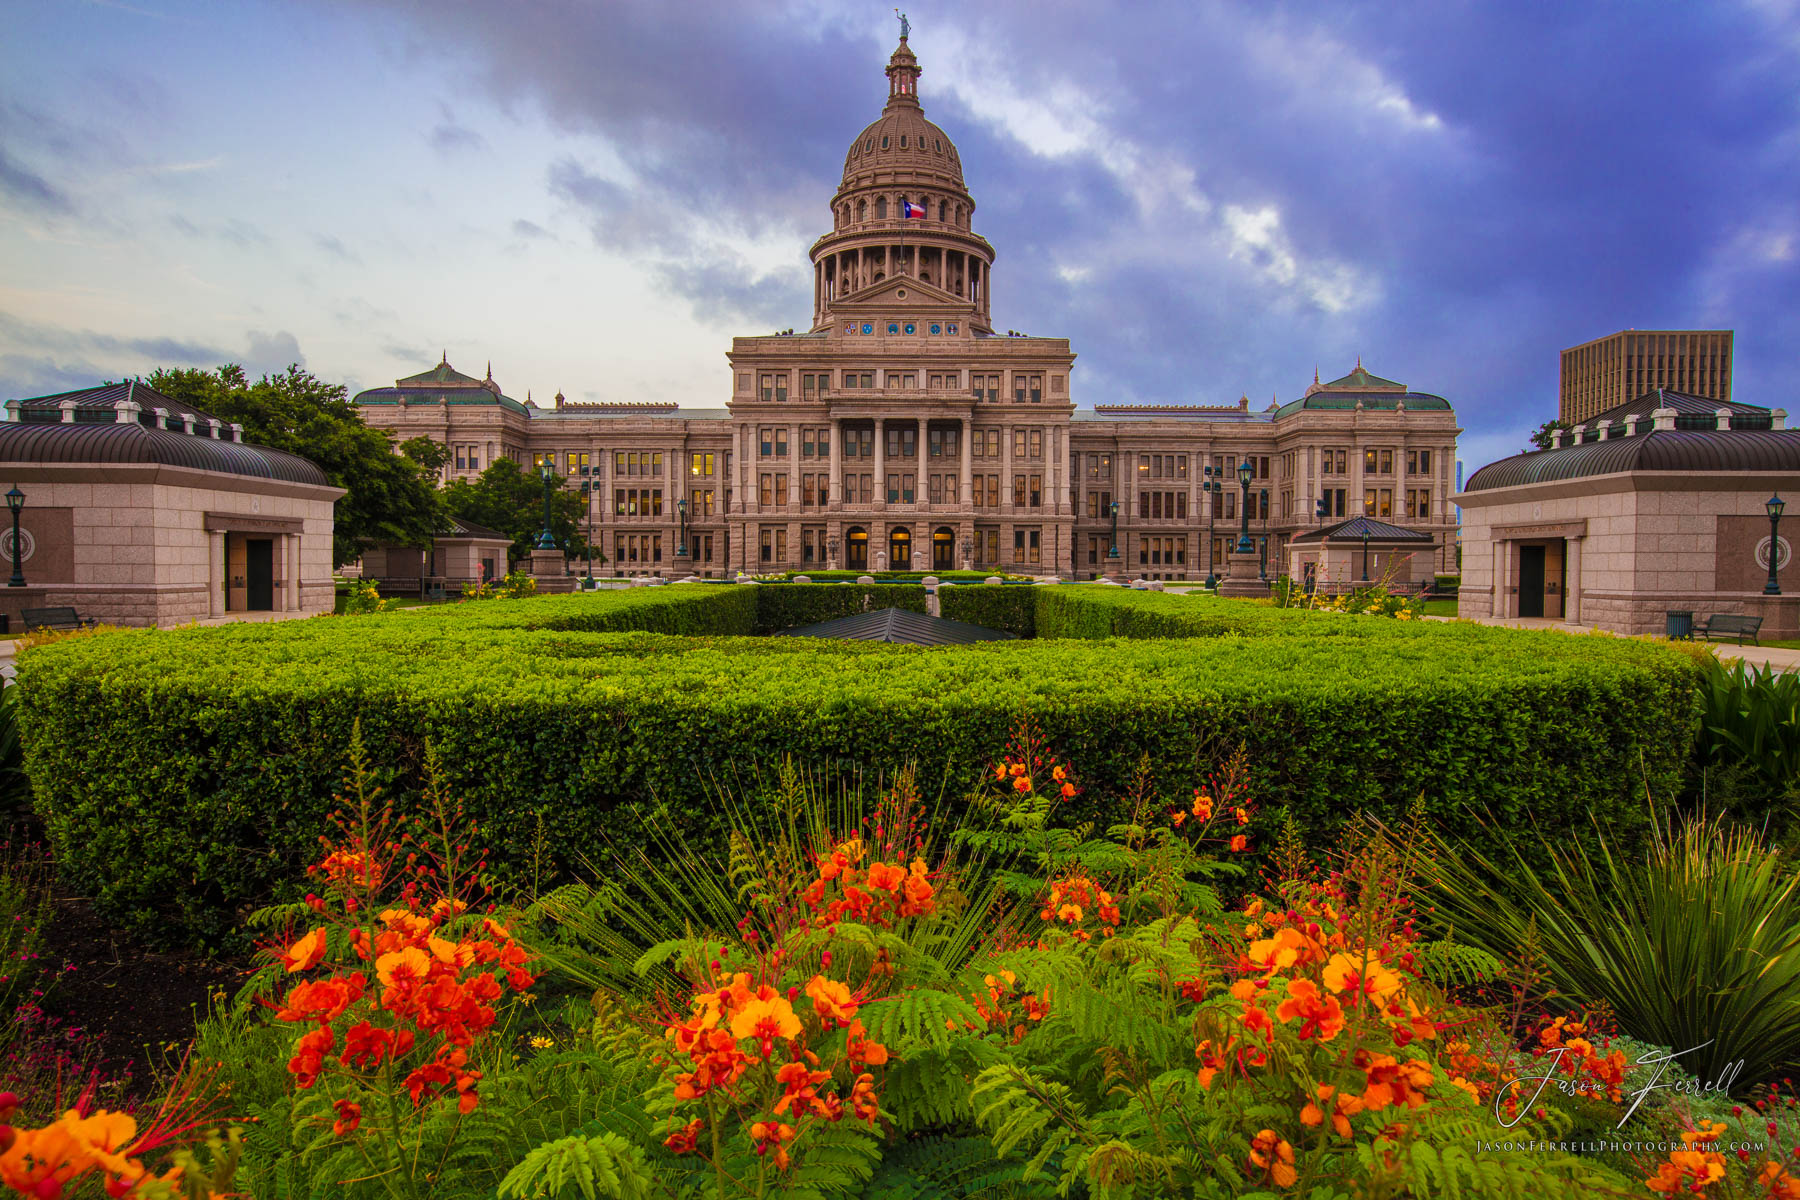 capstone, texas state capitol, building, downtown austin, govenor, legislature, dome, landscape, rotunda, historic, photo